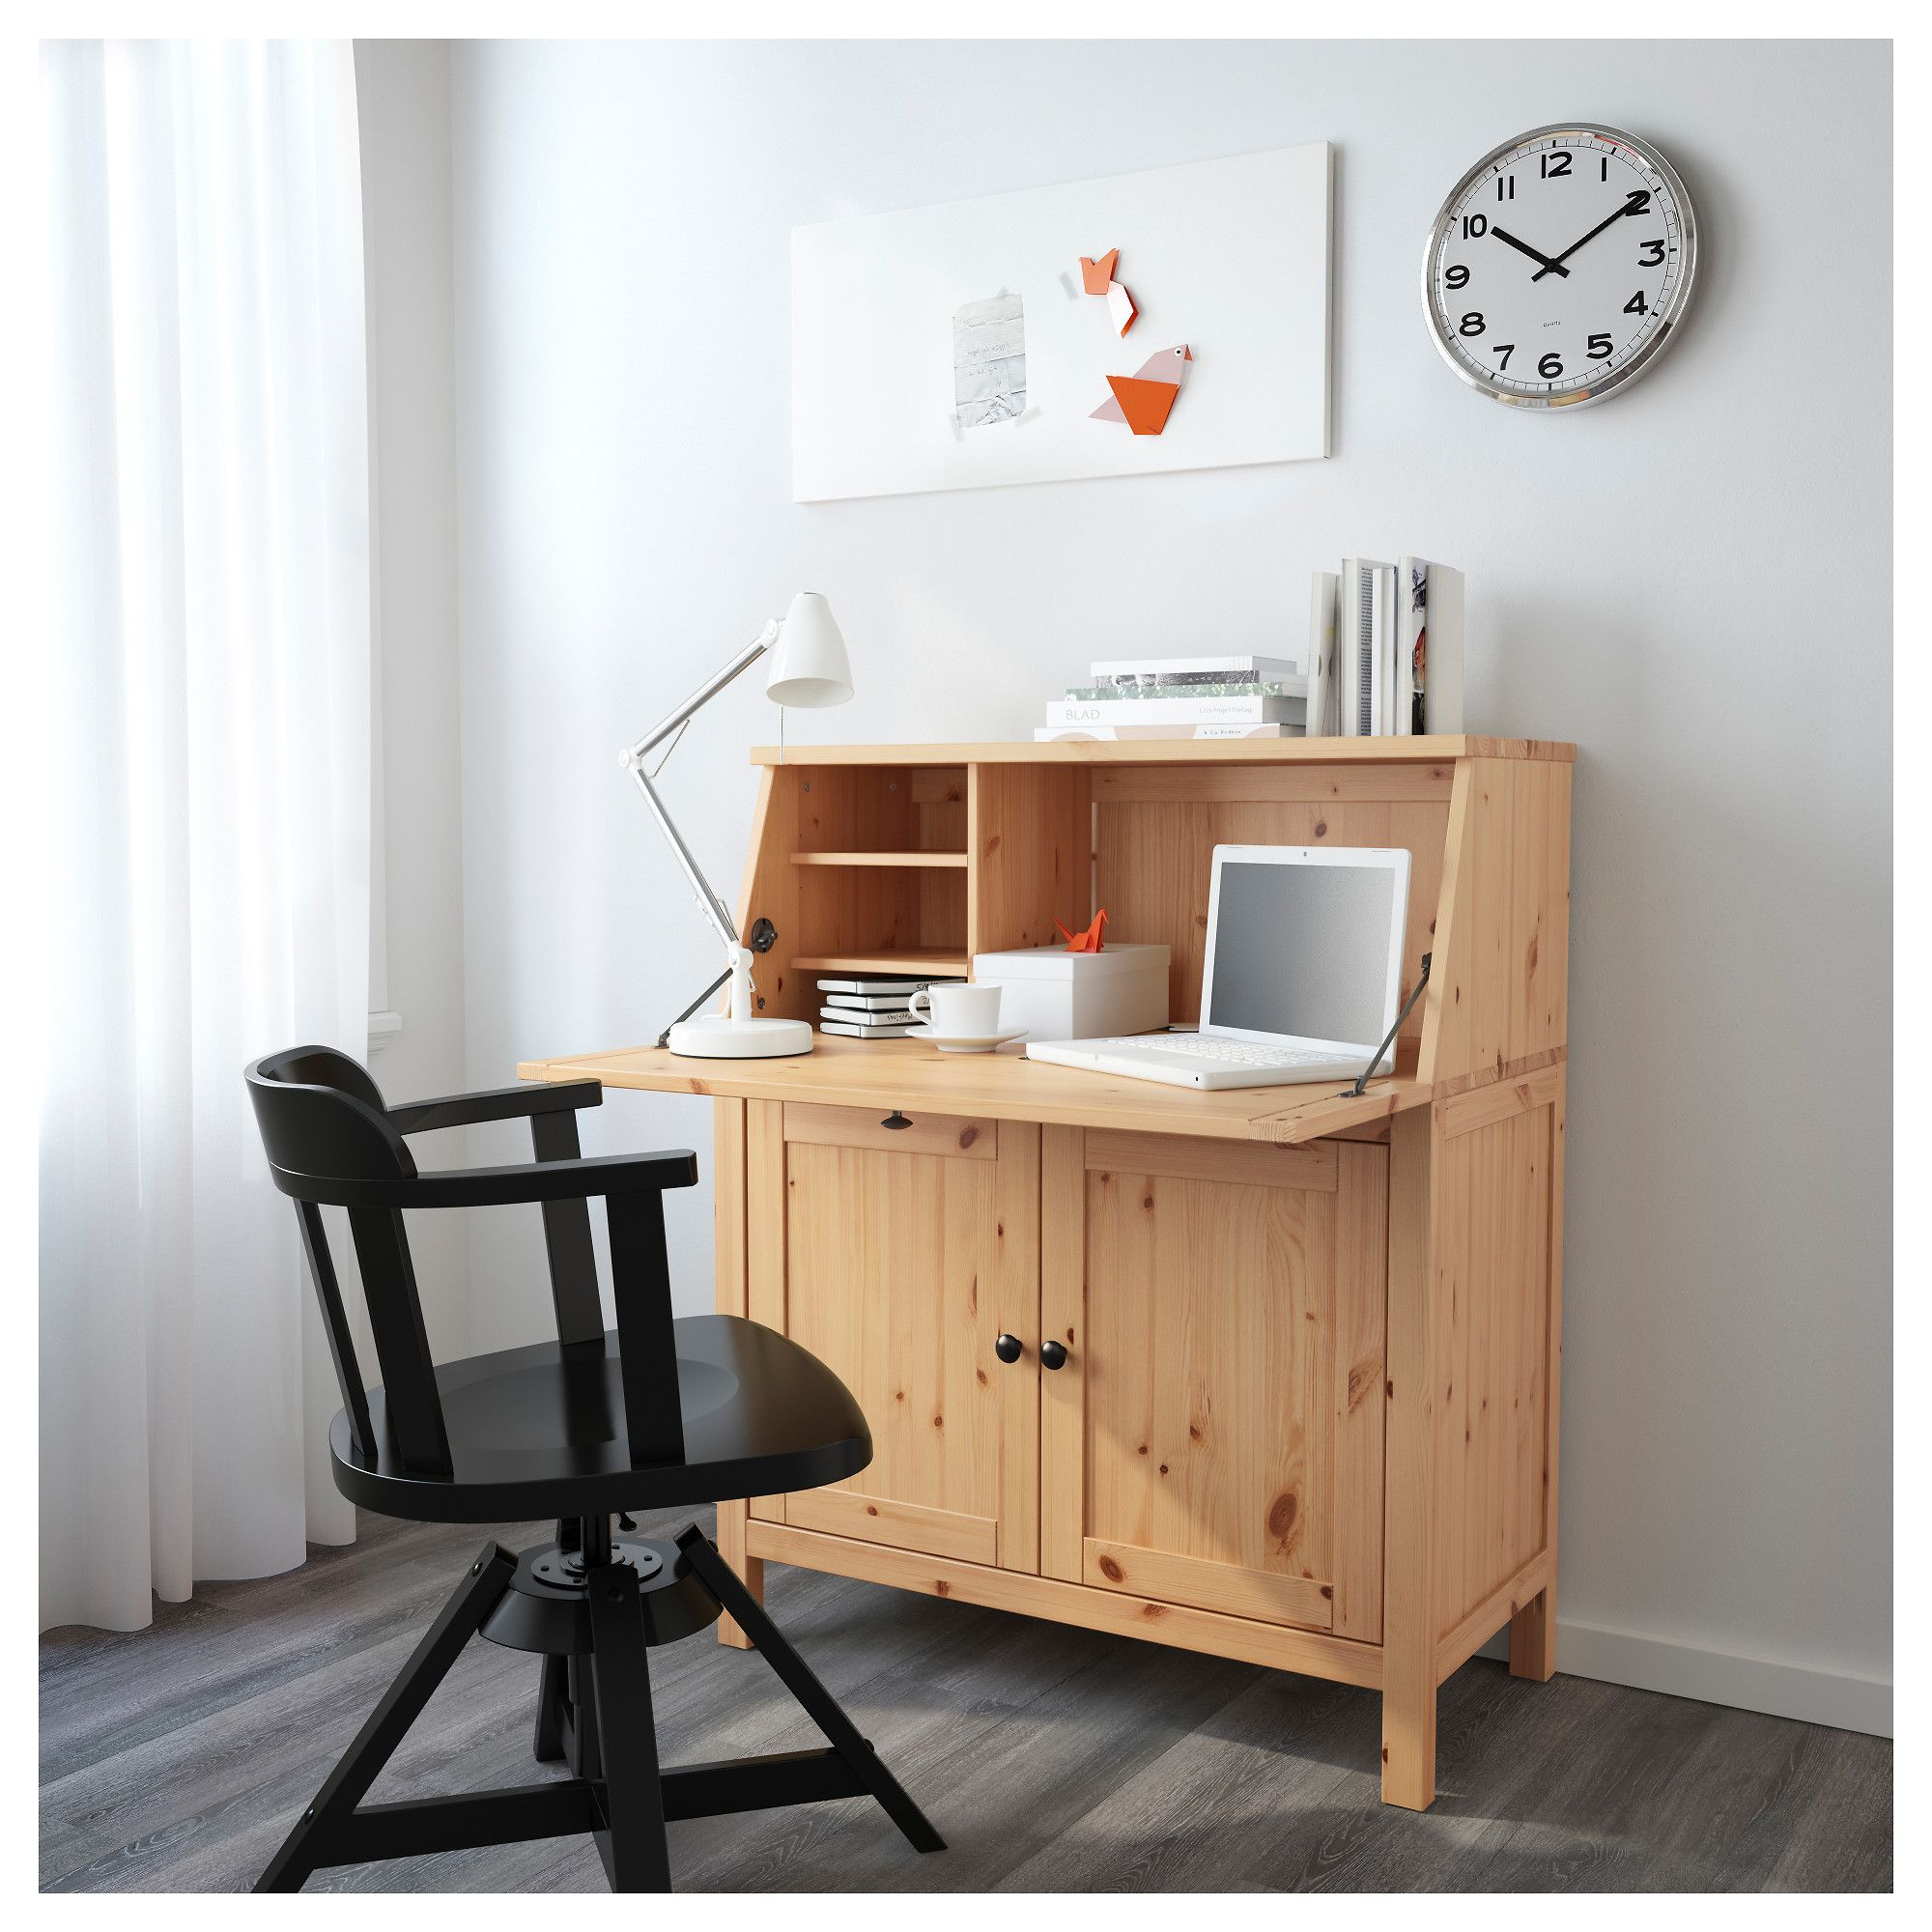 Hemnes Secretary Light Brown Ikea Home Office Furniture Ikea Secretary Desk Ikea Writing Desk